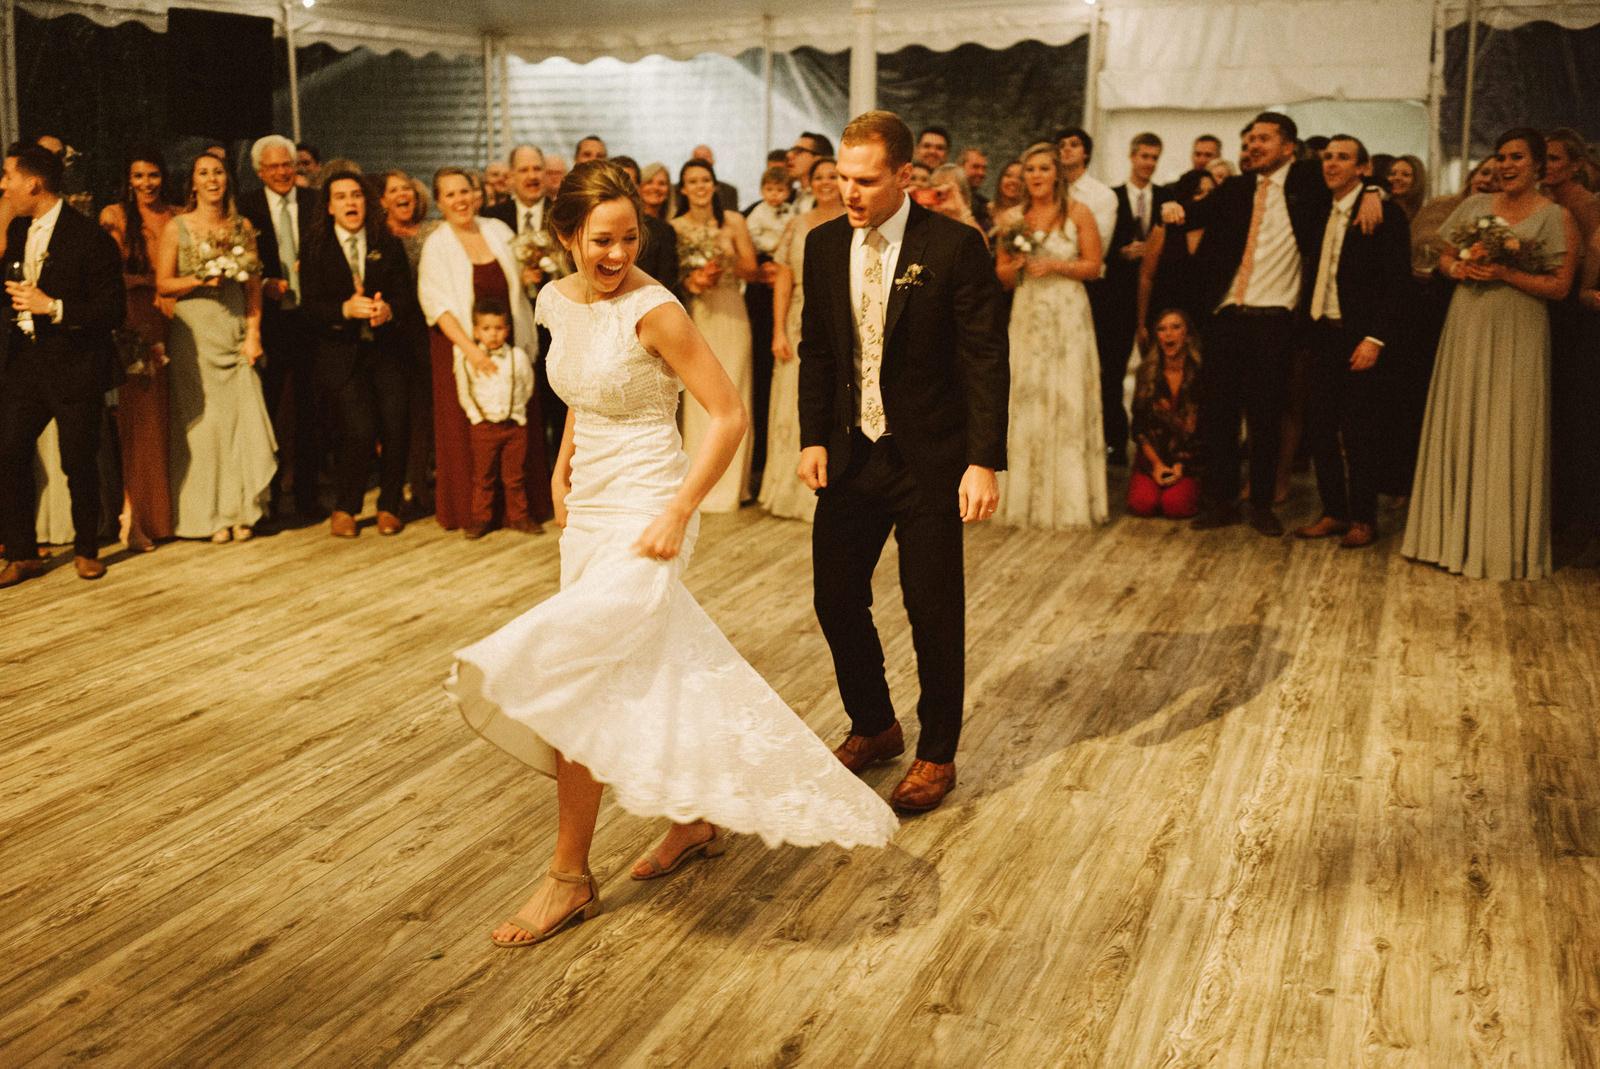 bridgeport-wedding-142 BRIDGEPORT, CONNECTICUT BACKYARD WEDDING